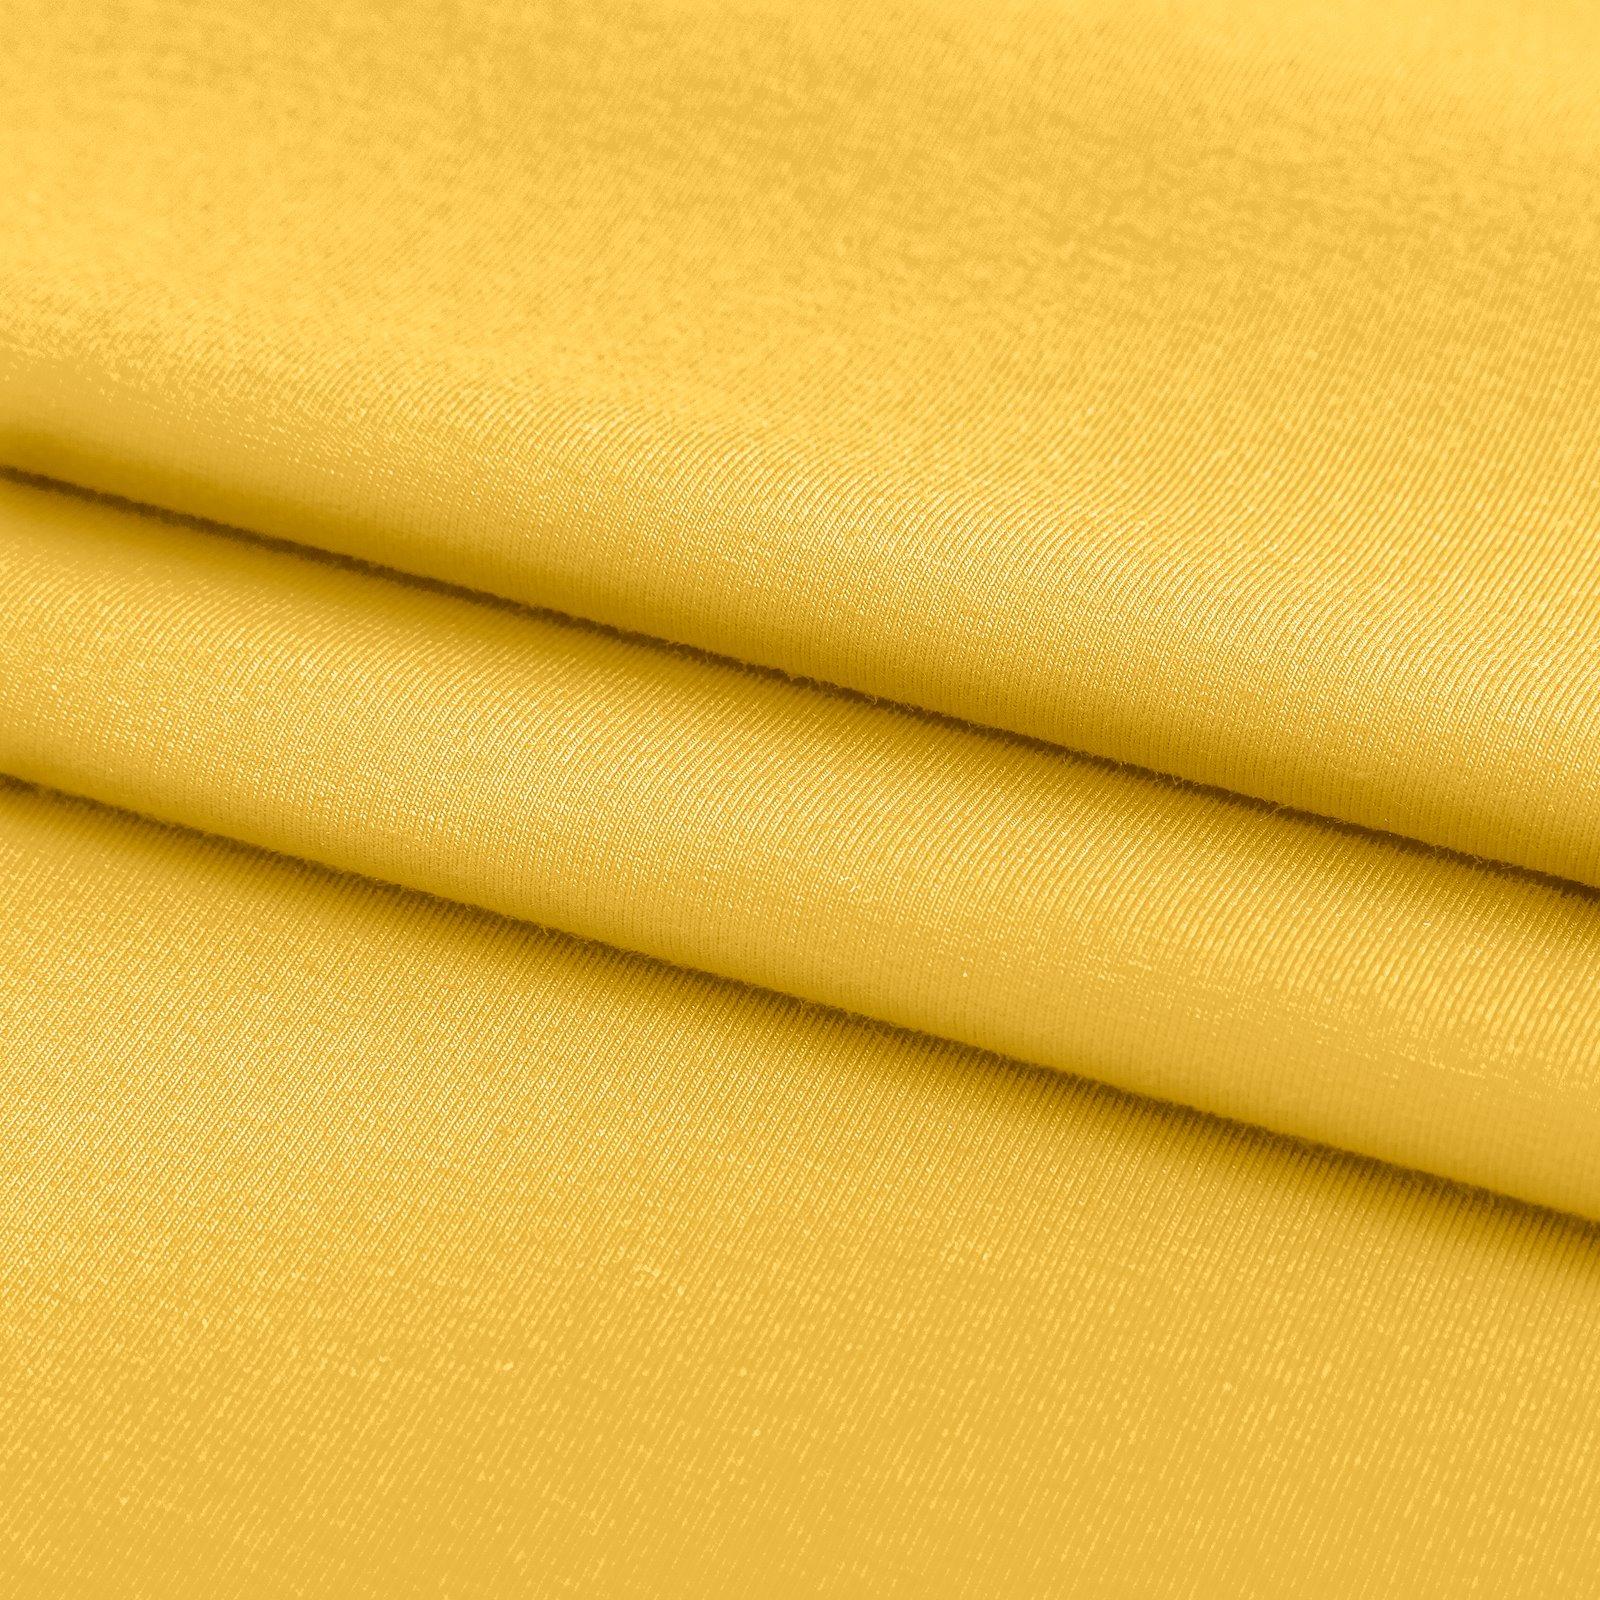 Organic stretch jersey light yellow 272651_pack_d